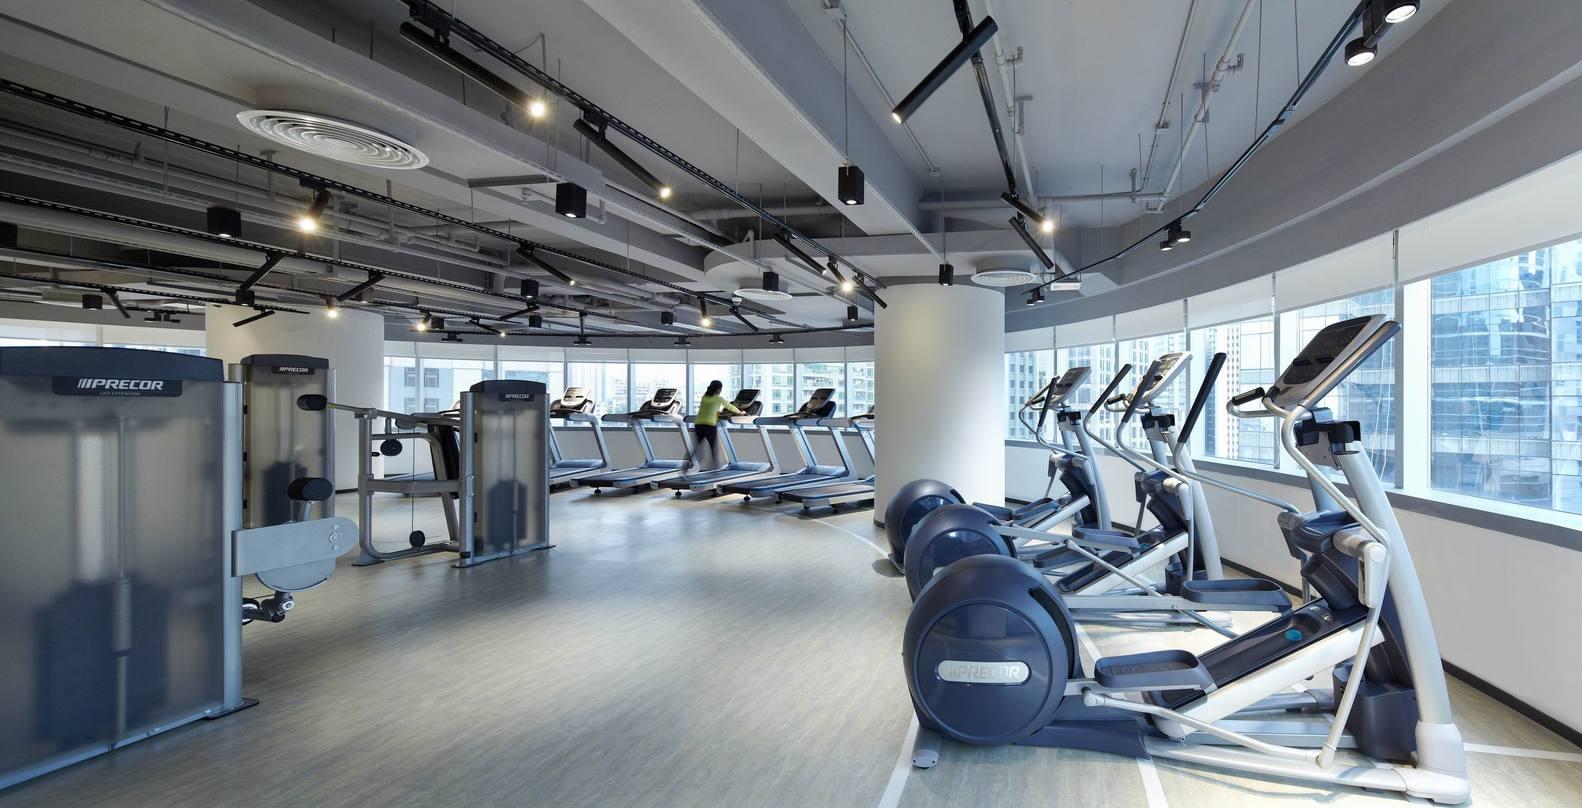 Дизайн спортивного центра – Тренажёрный зал